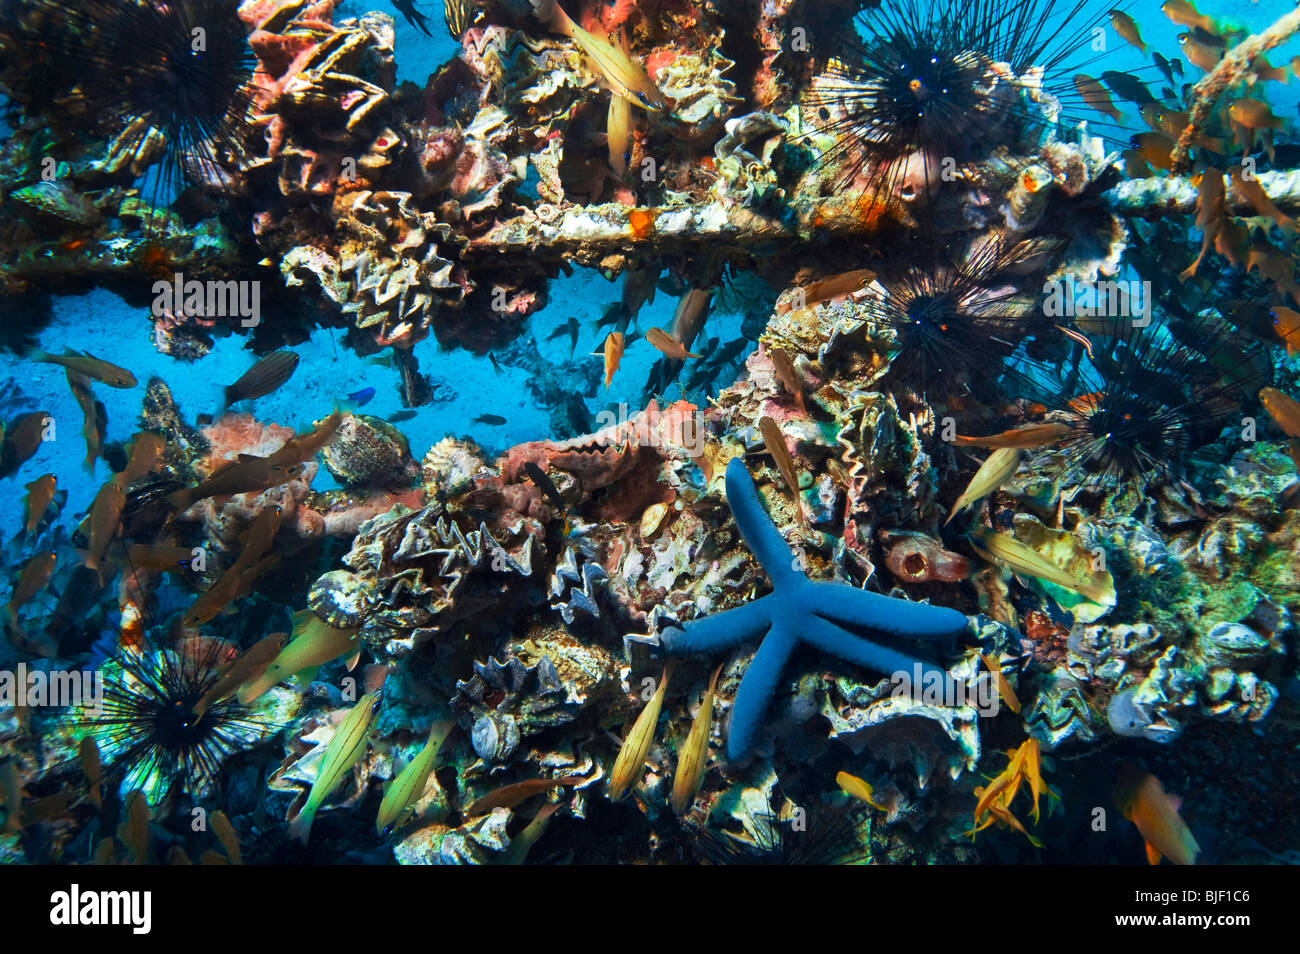 Malapascua manifold versatile multiplex life on artificial built reef fish starfish sea urchin under water underwater - Stock Image